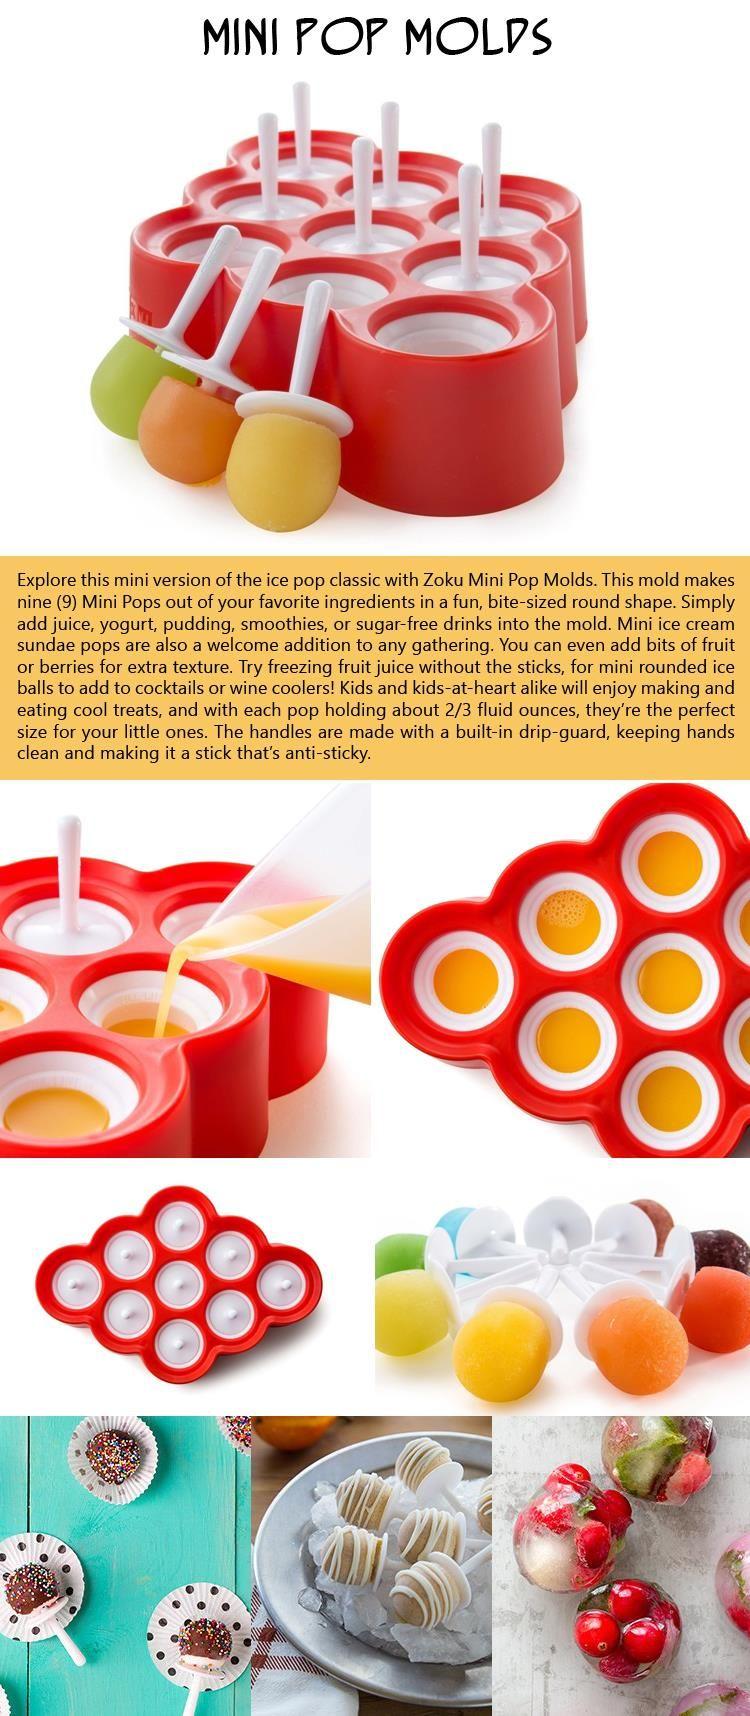 Simple Kitchen Gadgets That Are Borderline Genius - 10 Pics More